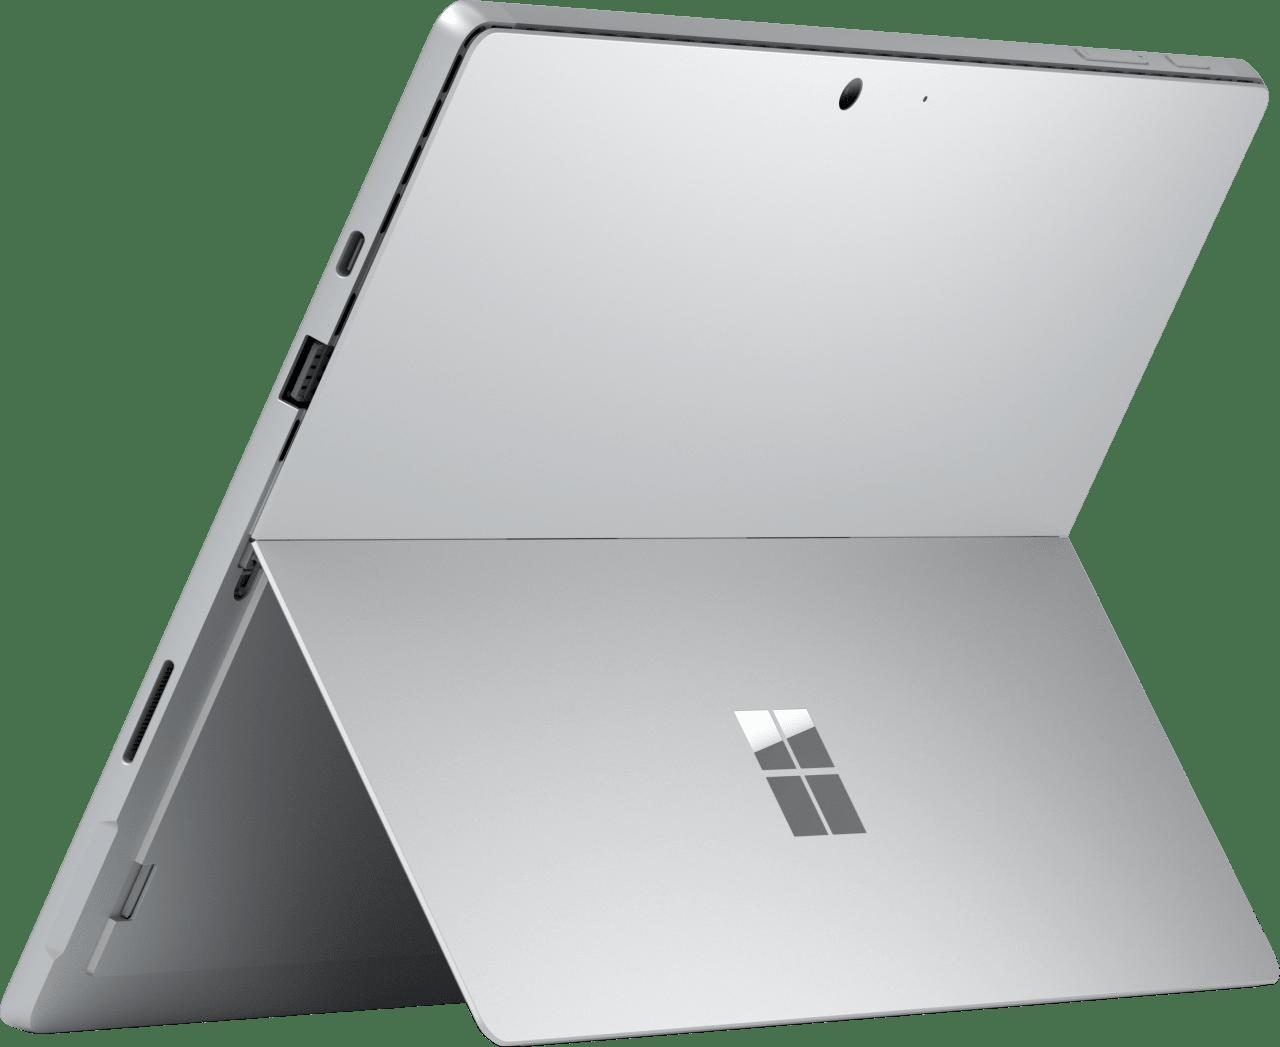 Platinum Microsoft Surface Pro 7 Wi-Fi 512GB.3